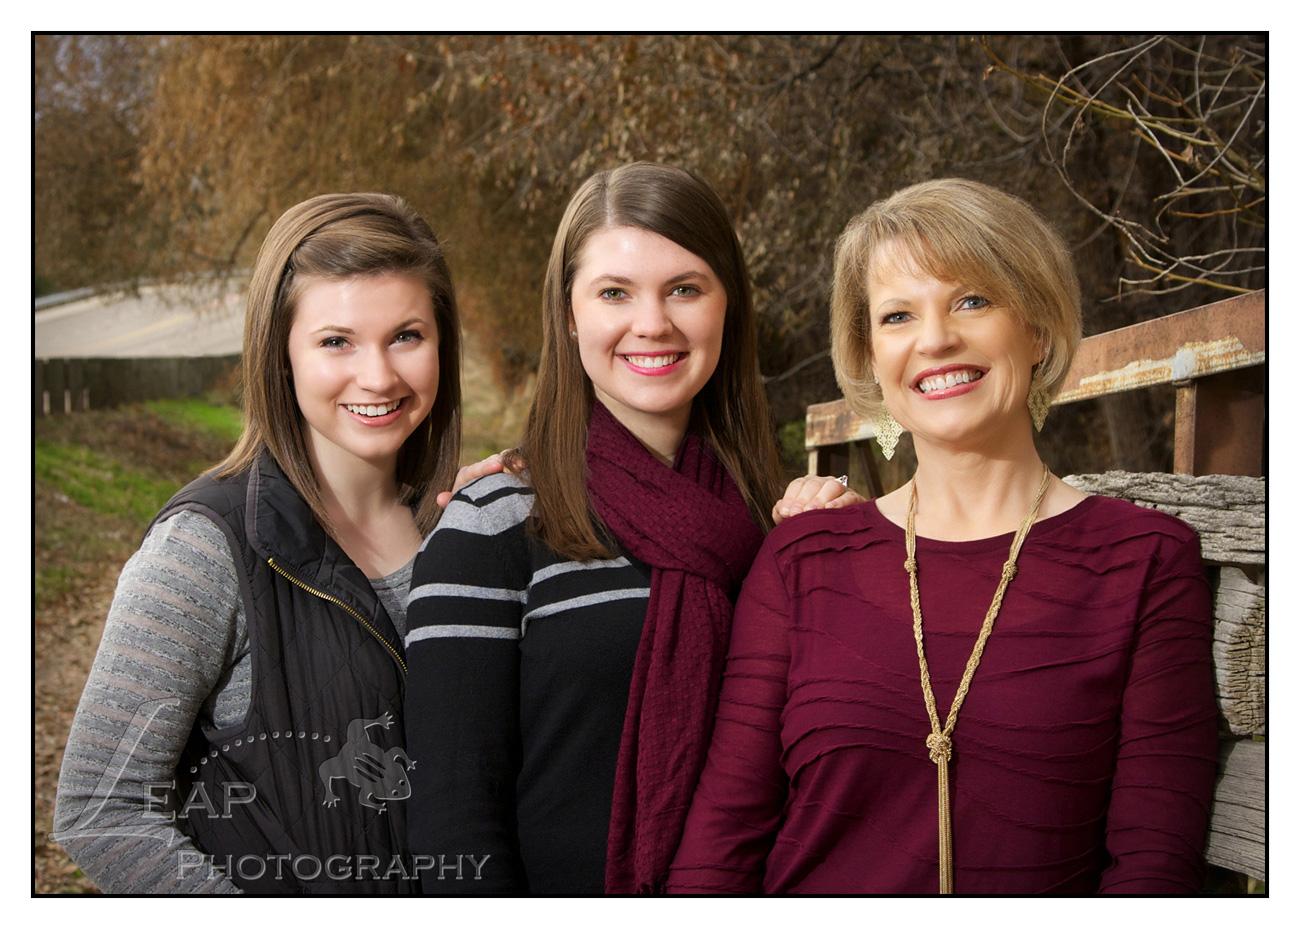 Family Portrait in Boise, Idaho park